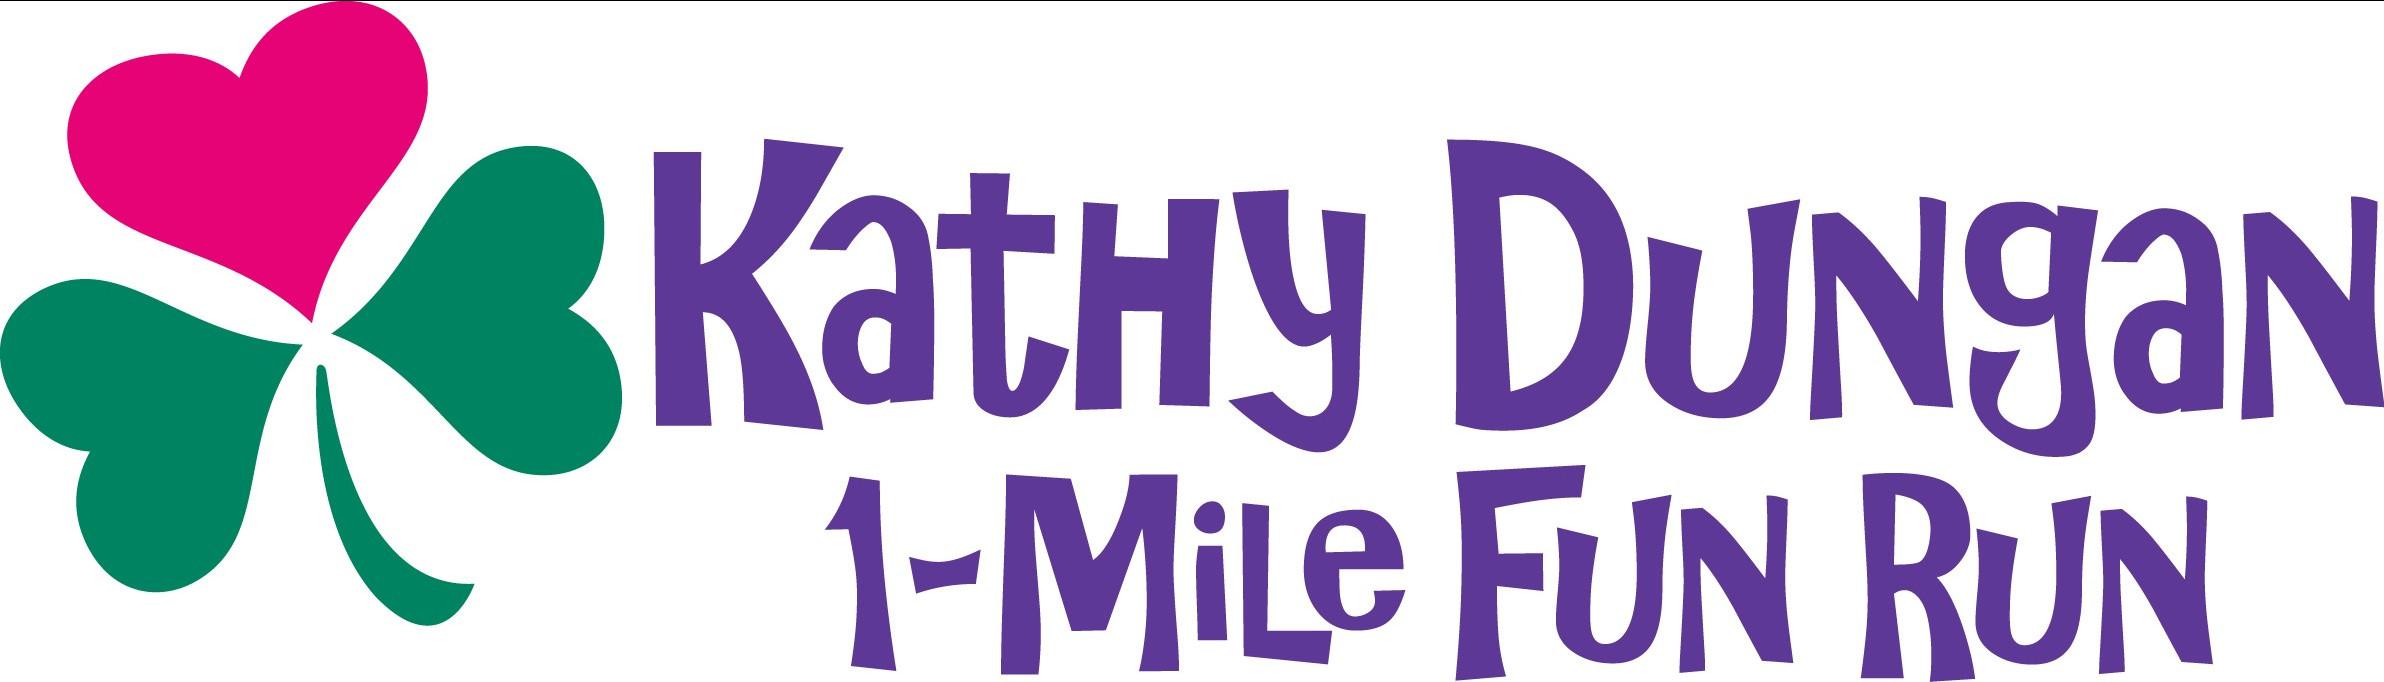 Kathy Dungan 1-Mile Fun Run